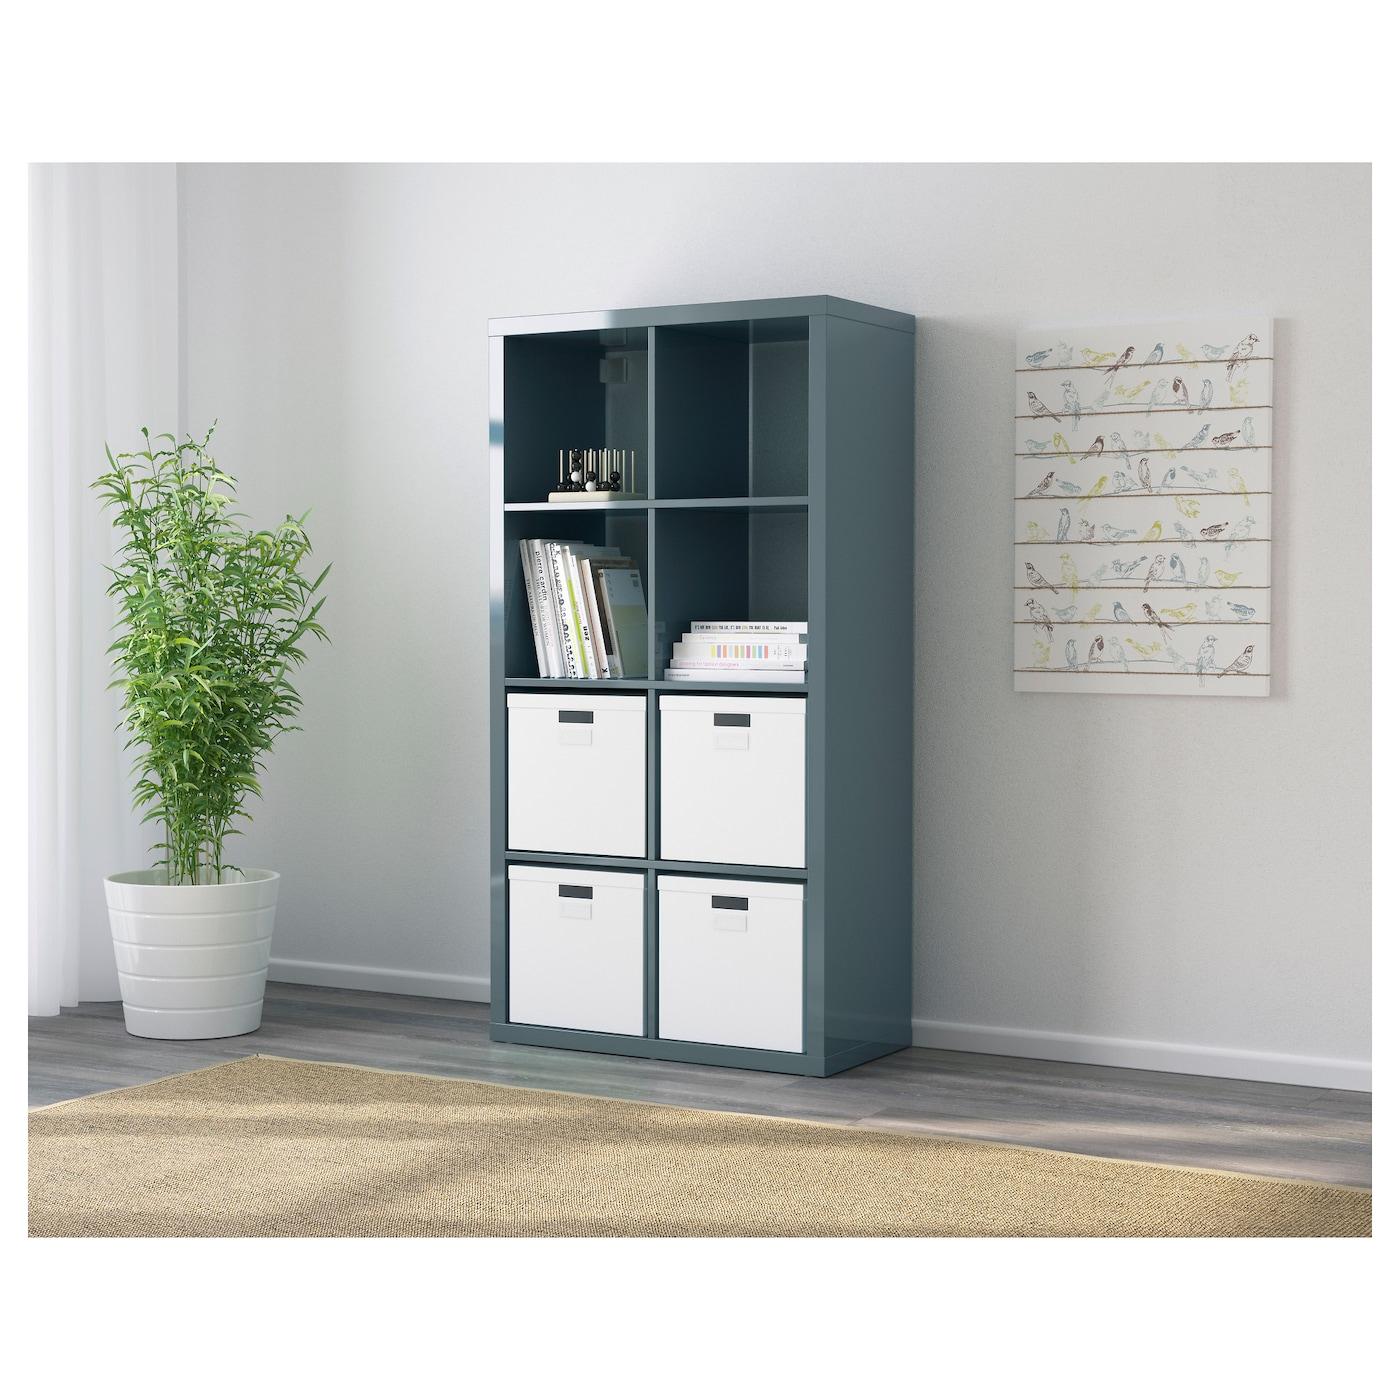 Kallax shelving unit high gloss grey turquoise 77 x 147 cm - Colonne ikea kallax ...